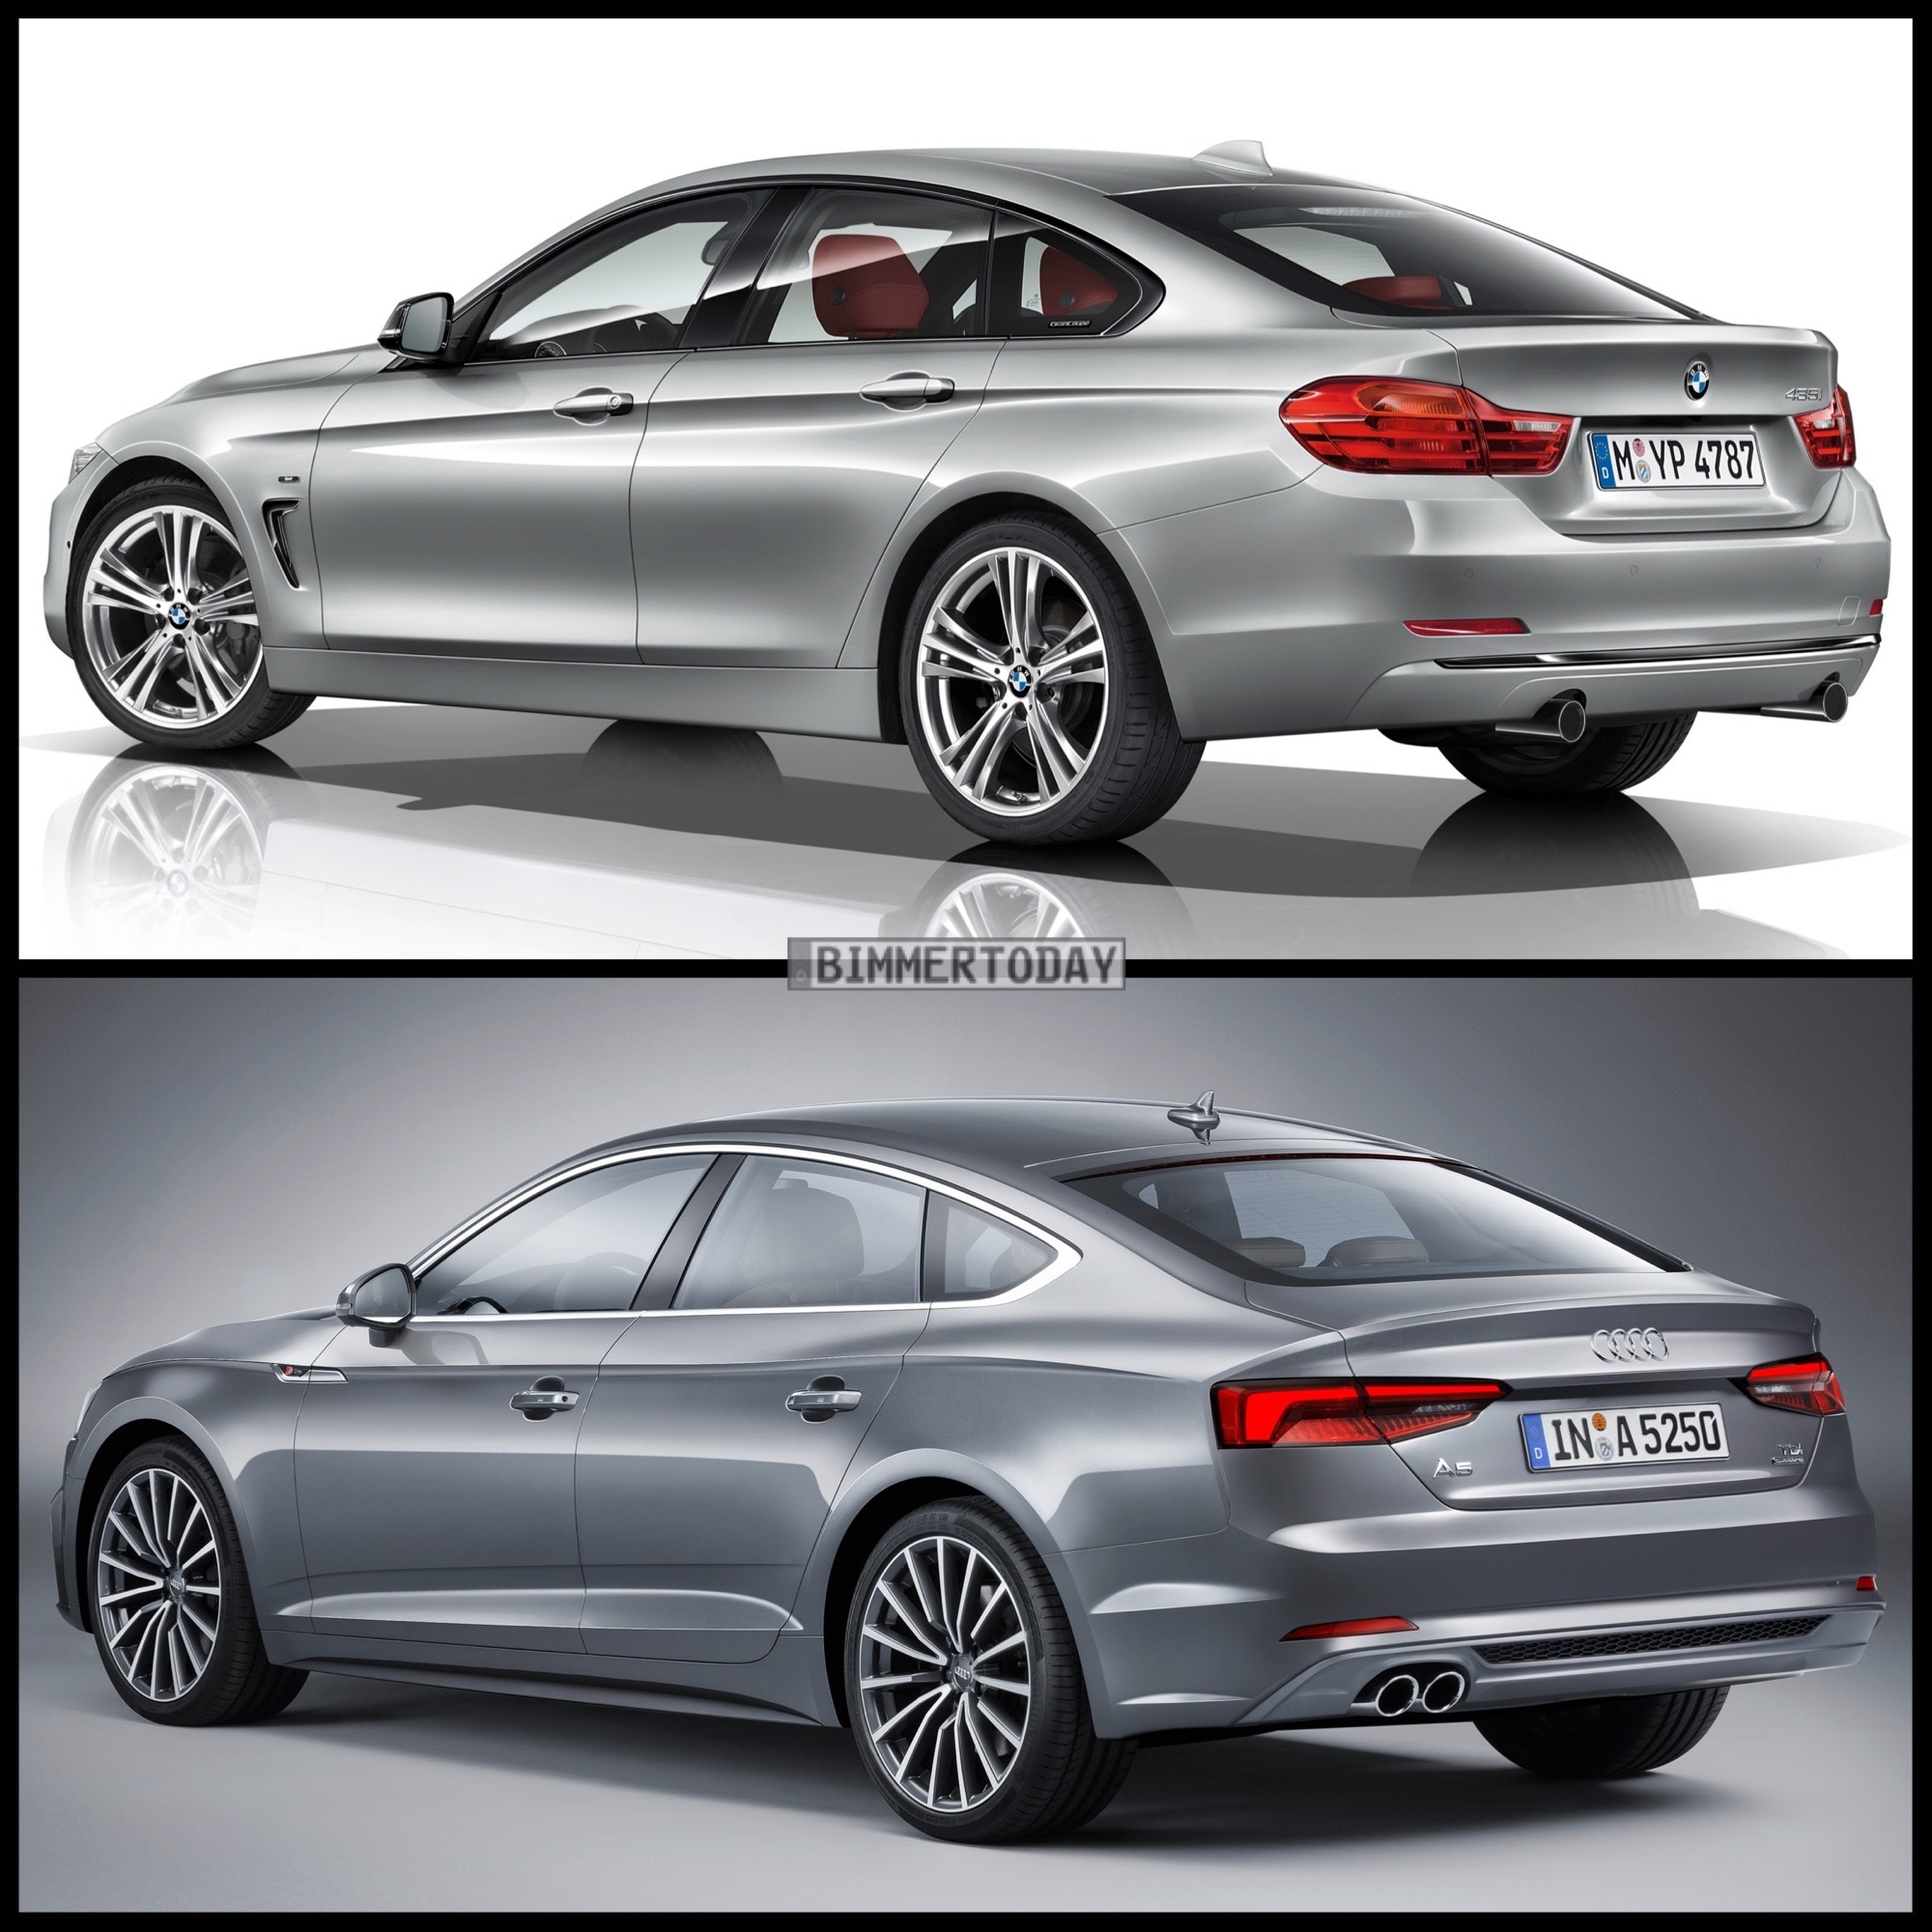 Photo Comparison: BMW 4 Series Gran Coupe Vs Audi A5 Sportback